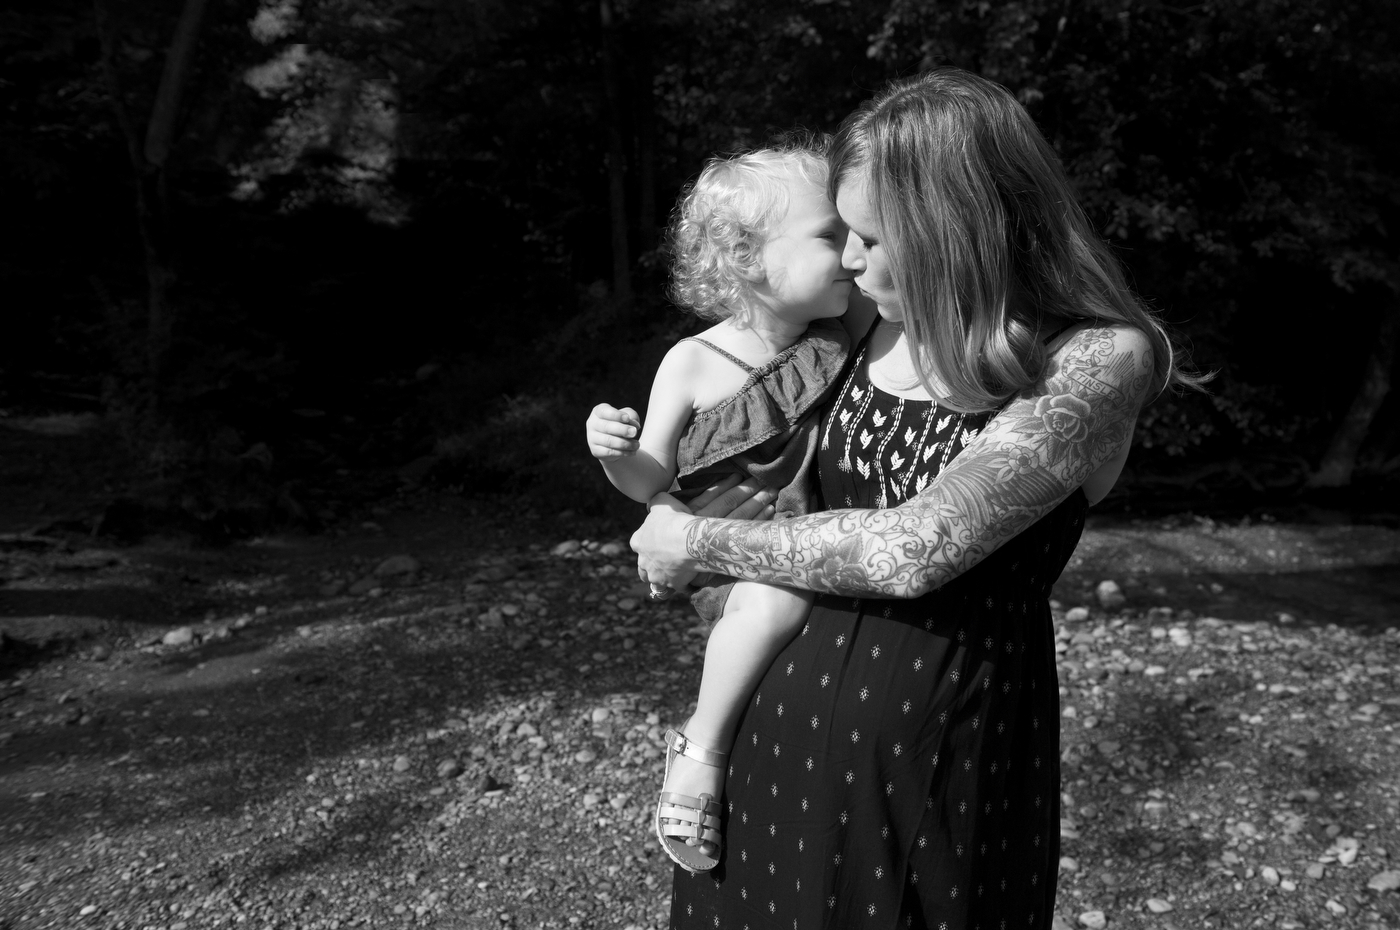 081416_Martin&Kelly&Alice&Baby_blog_77.JPG